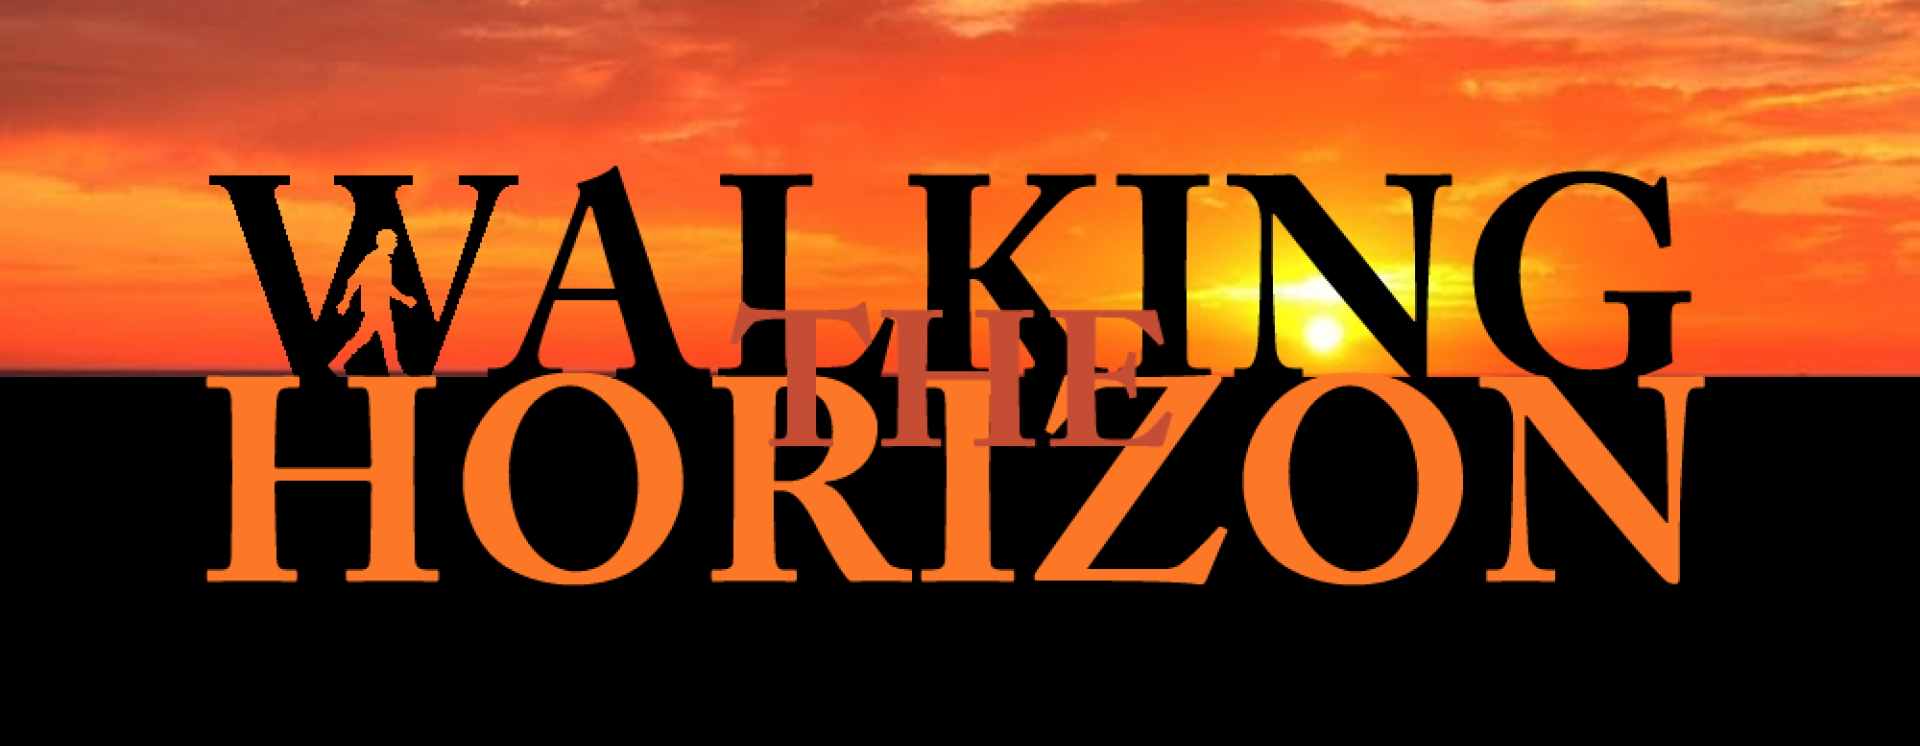 1421542719 walking the horizon 2 copy